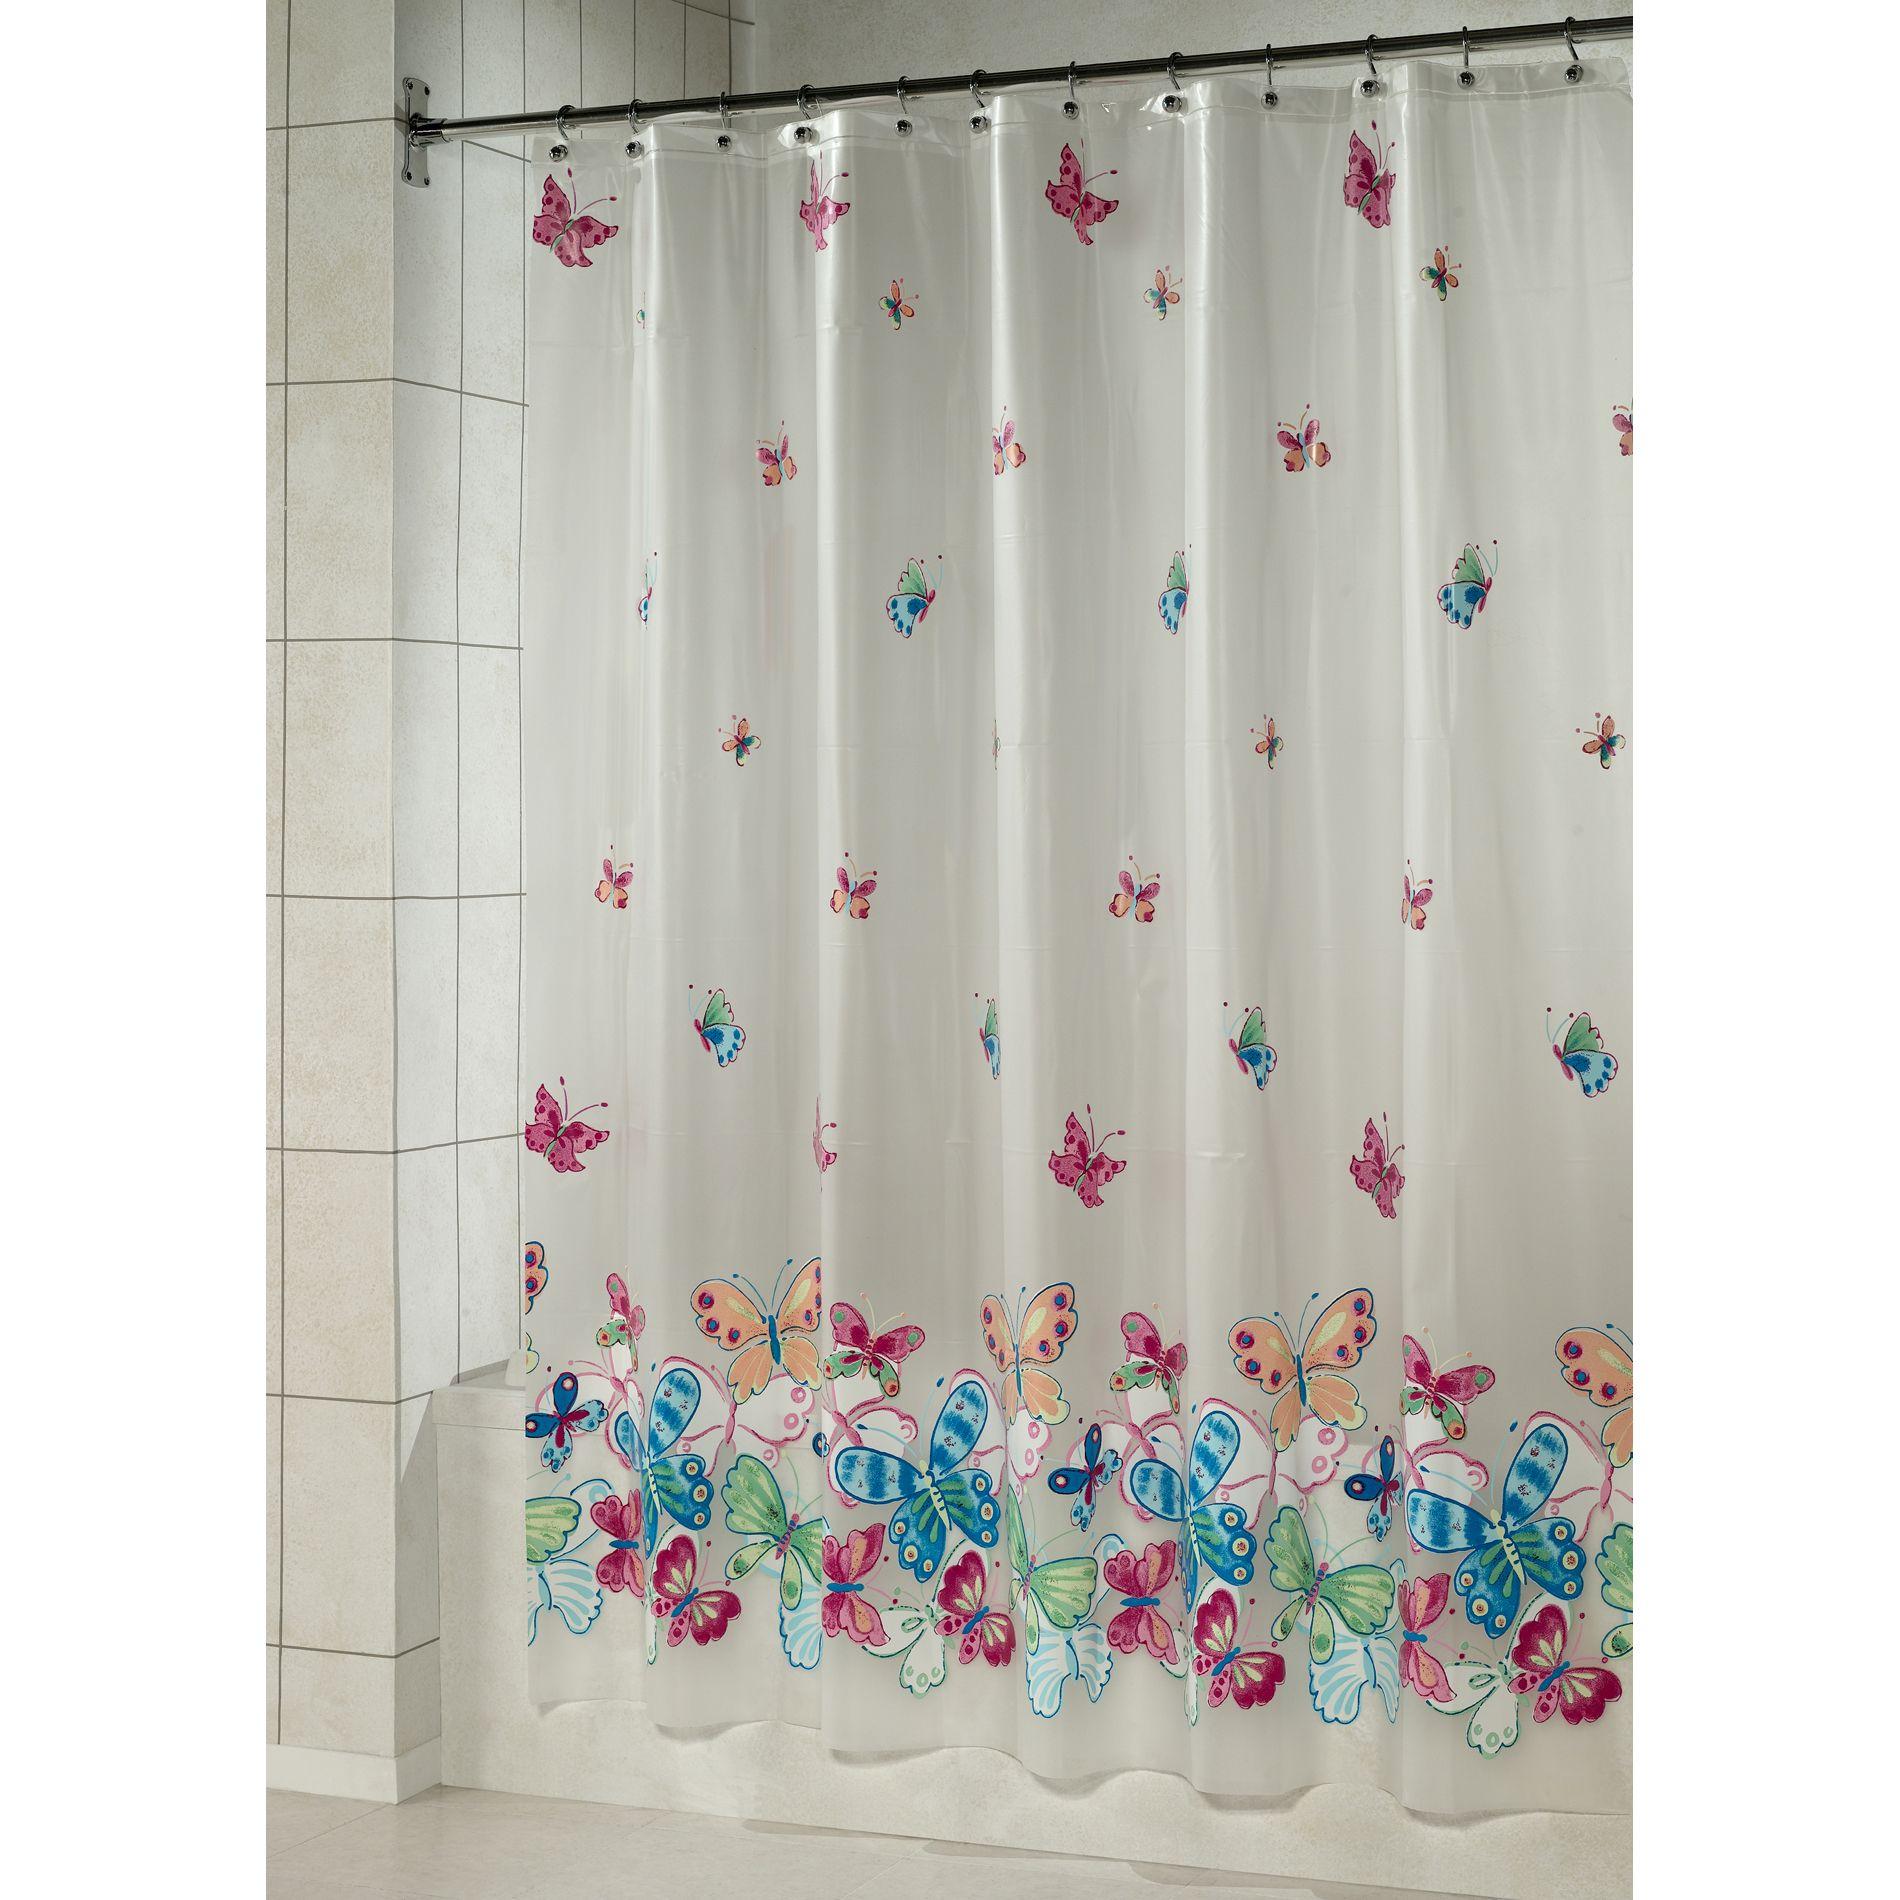 Essential home shower curtain butterfly border vinyl peva home bed bath bath bathroom accessories shower curtains bath accessories